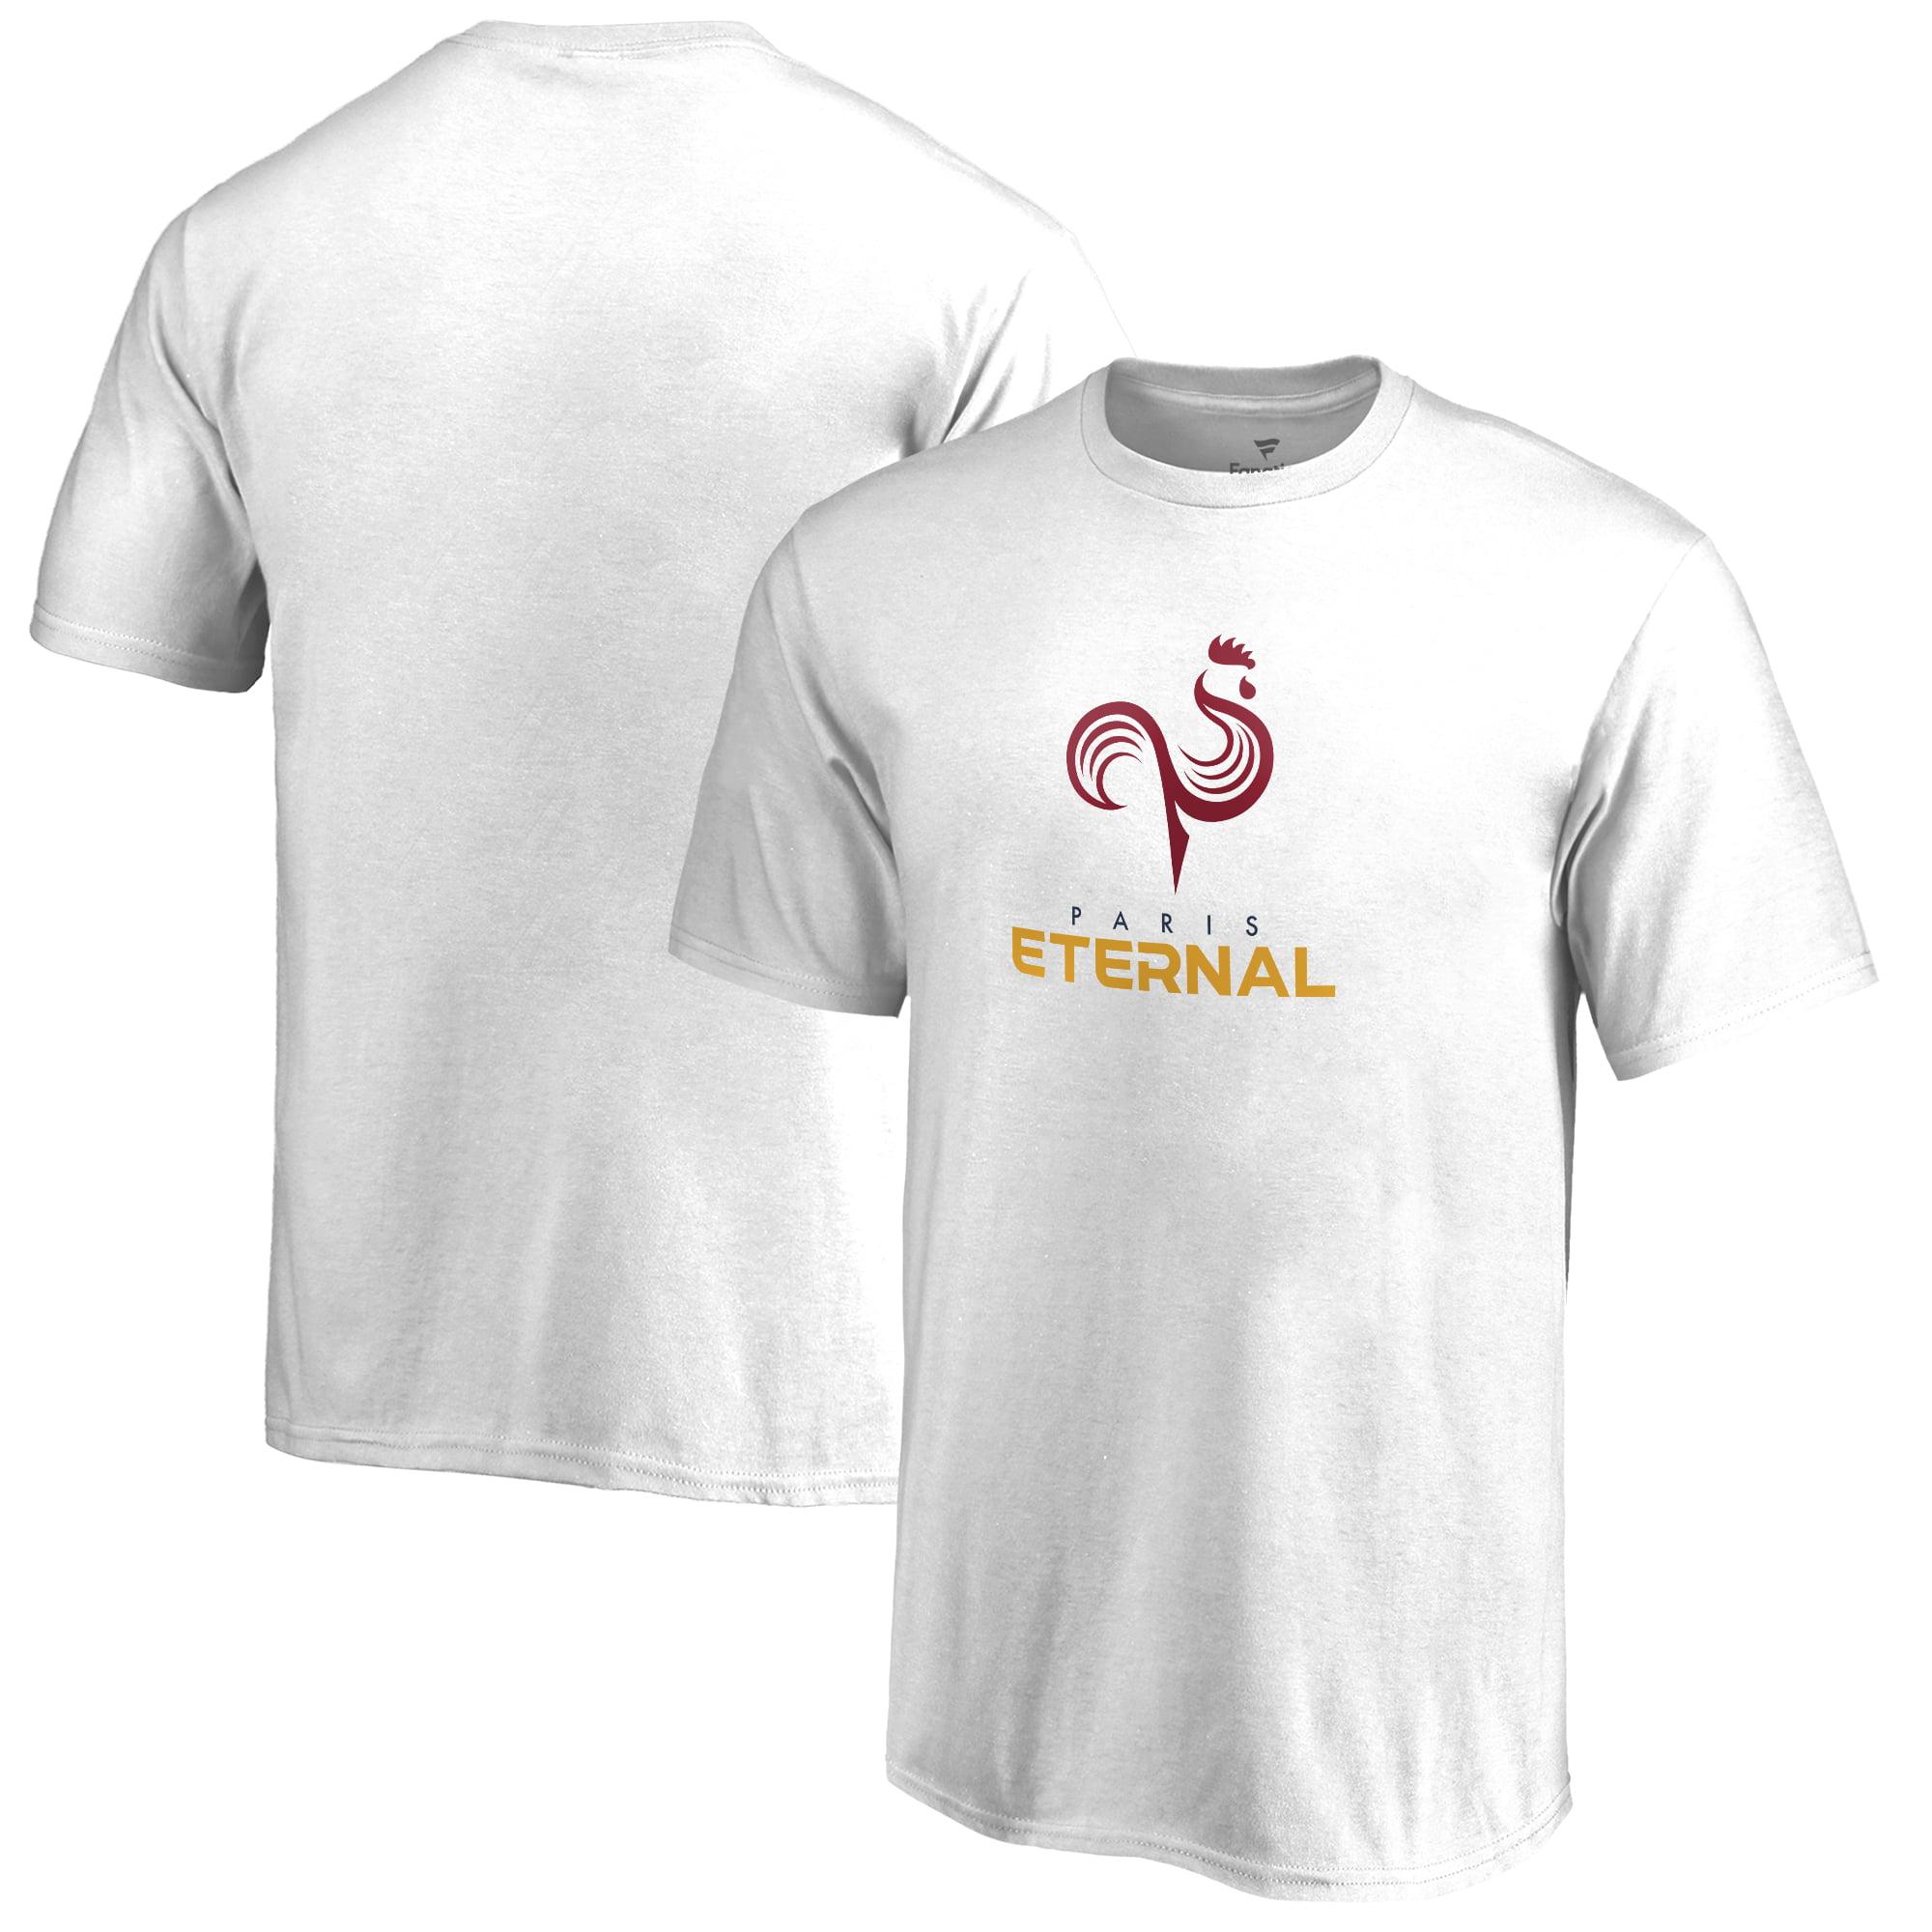 Paris Eternal Fanatics Branded Youth Team Identity T-Shirt - White